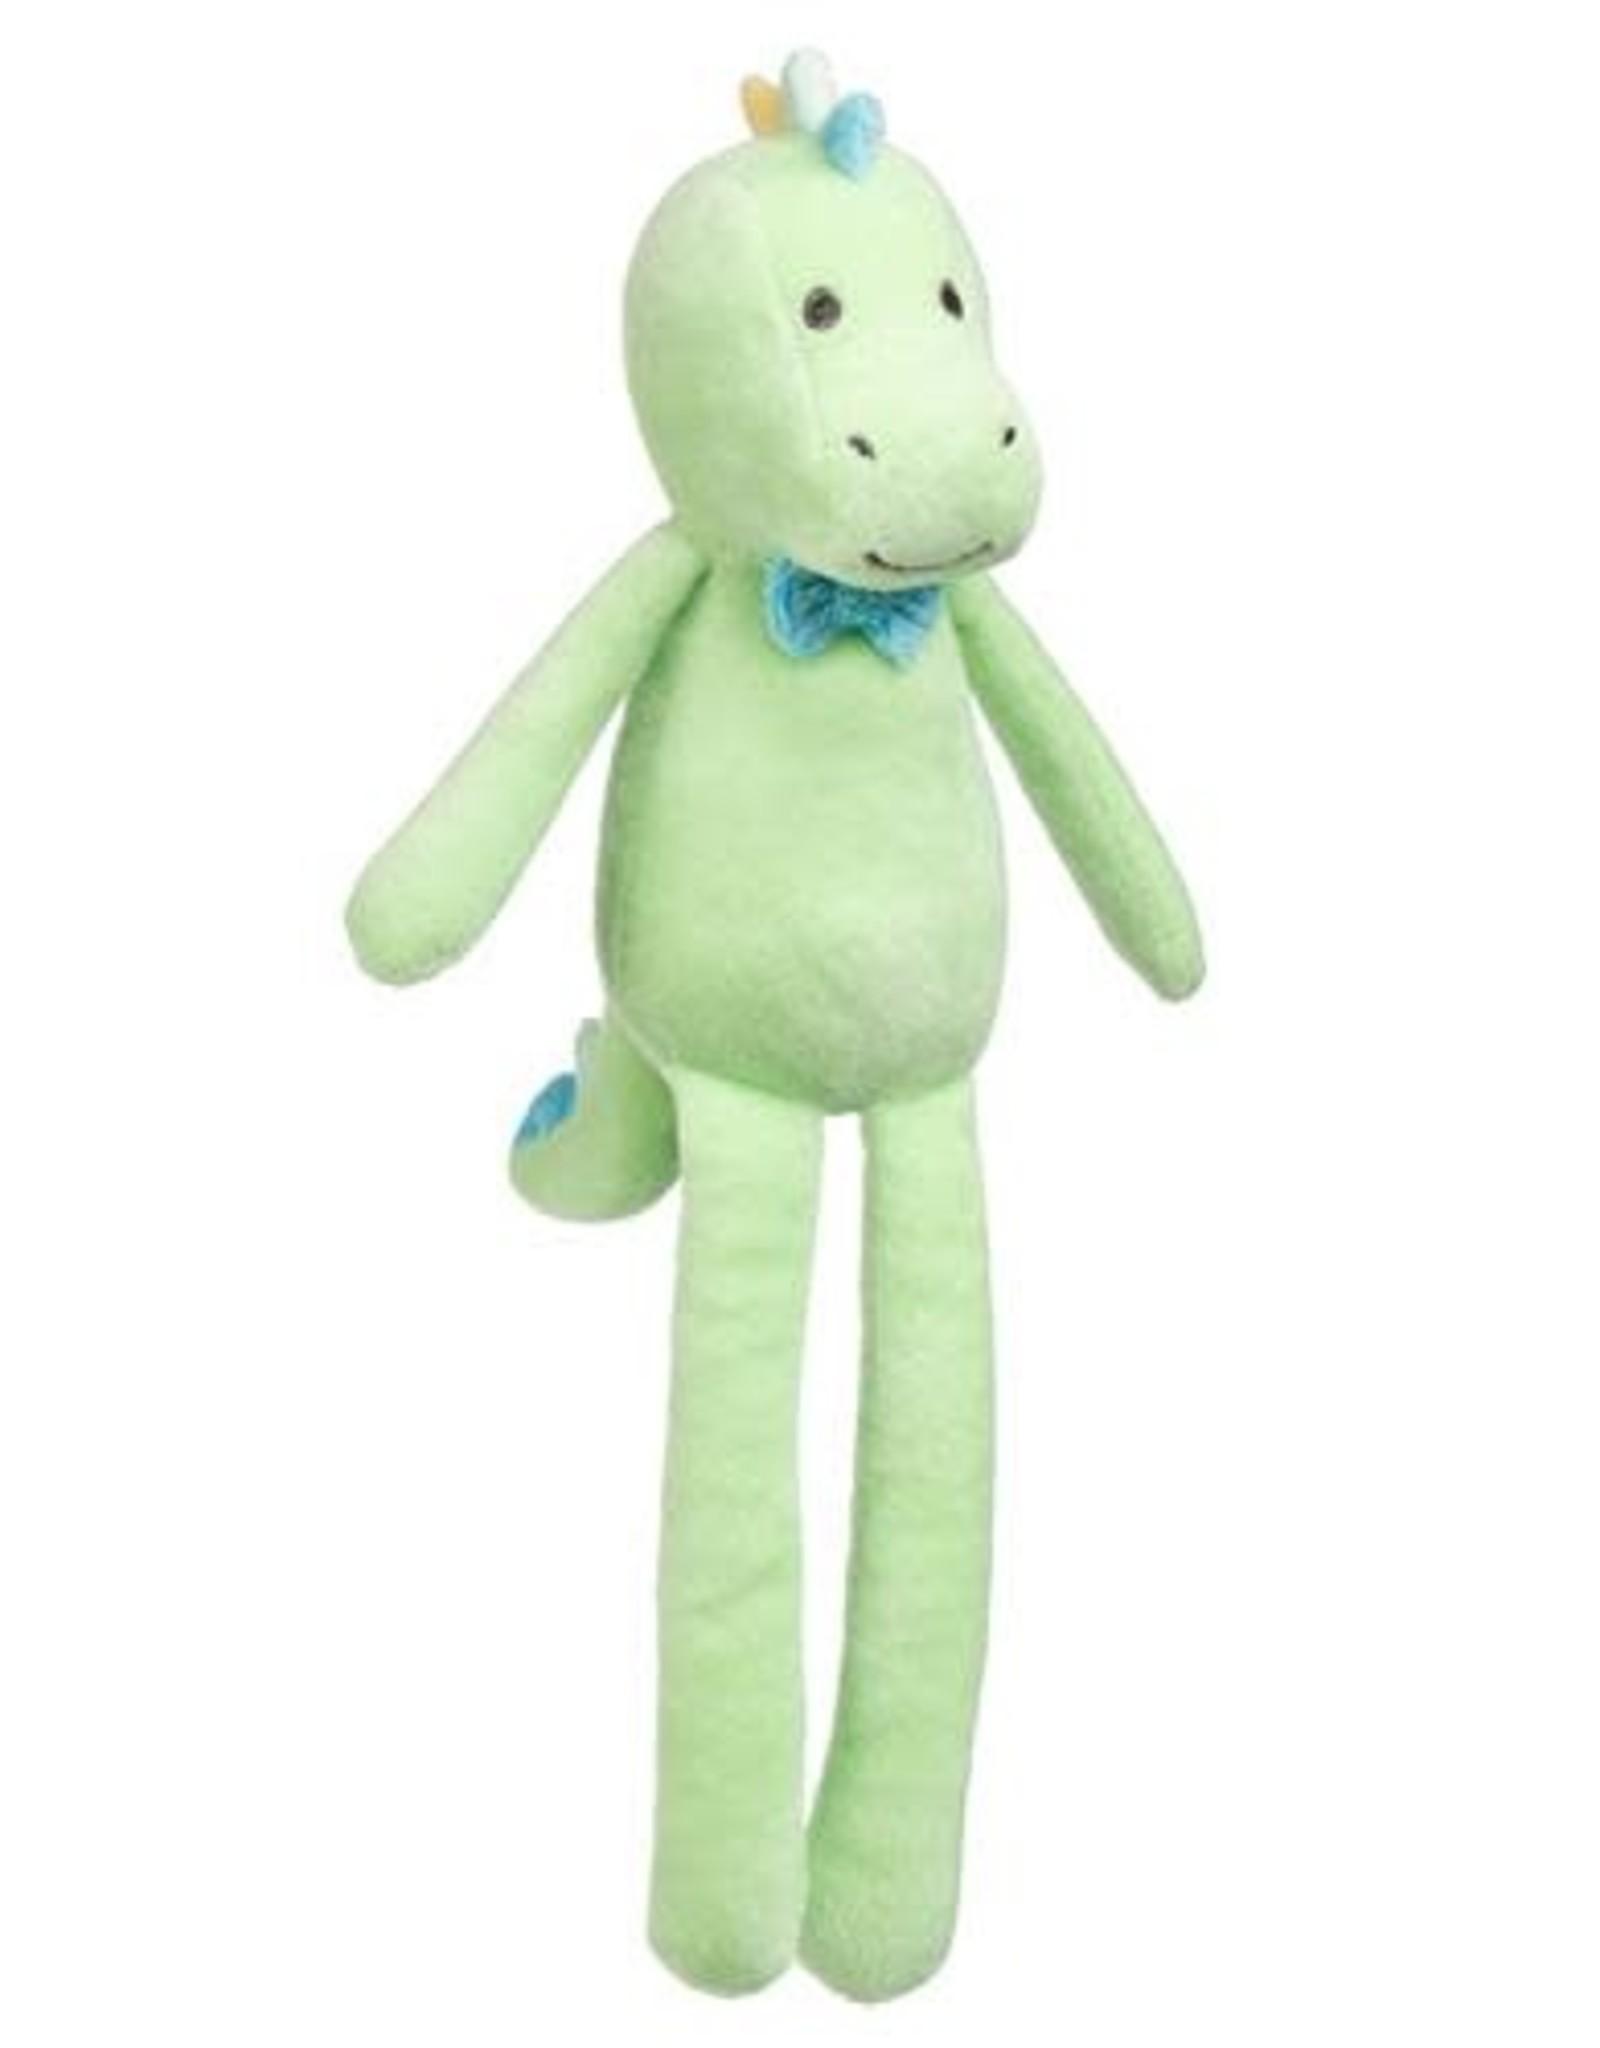 Stephen Joseph Super Soft Plush Doll - Small Dino